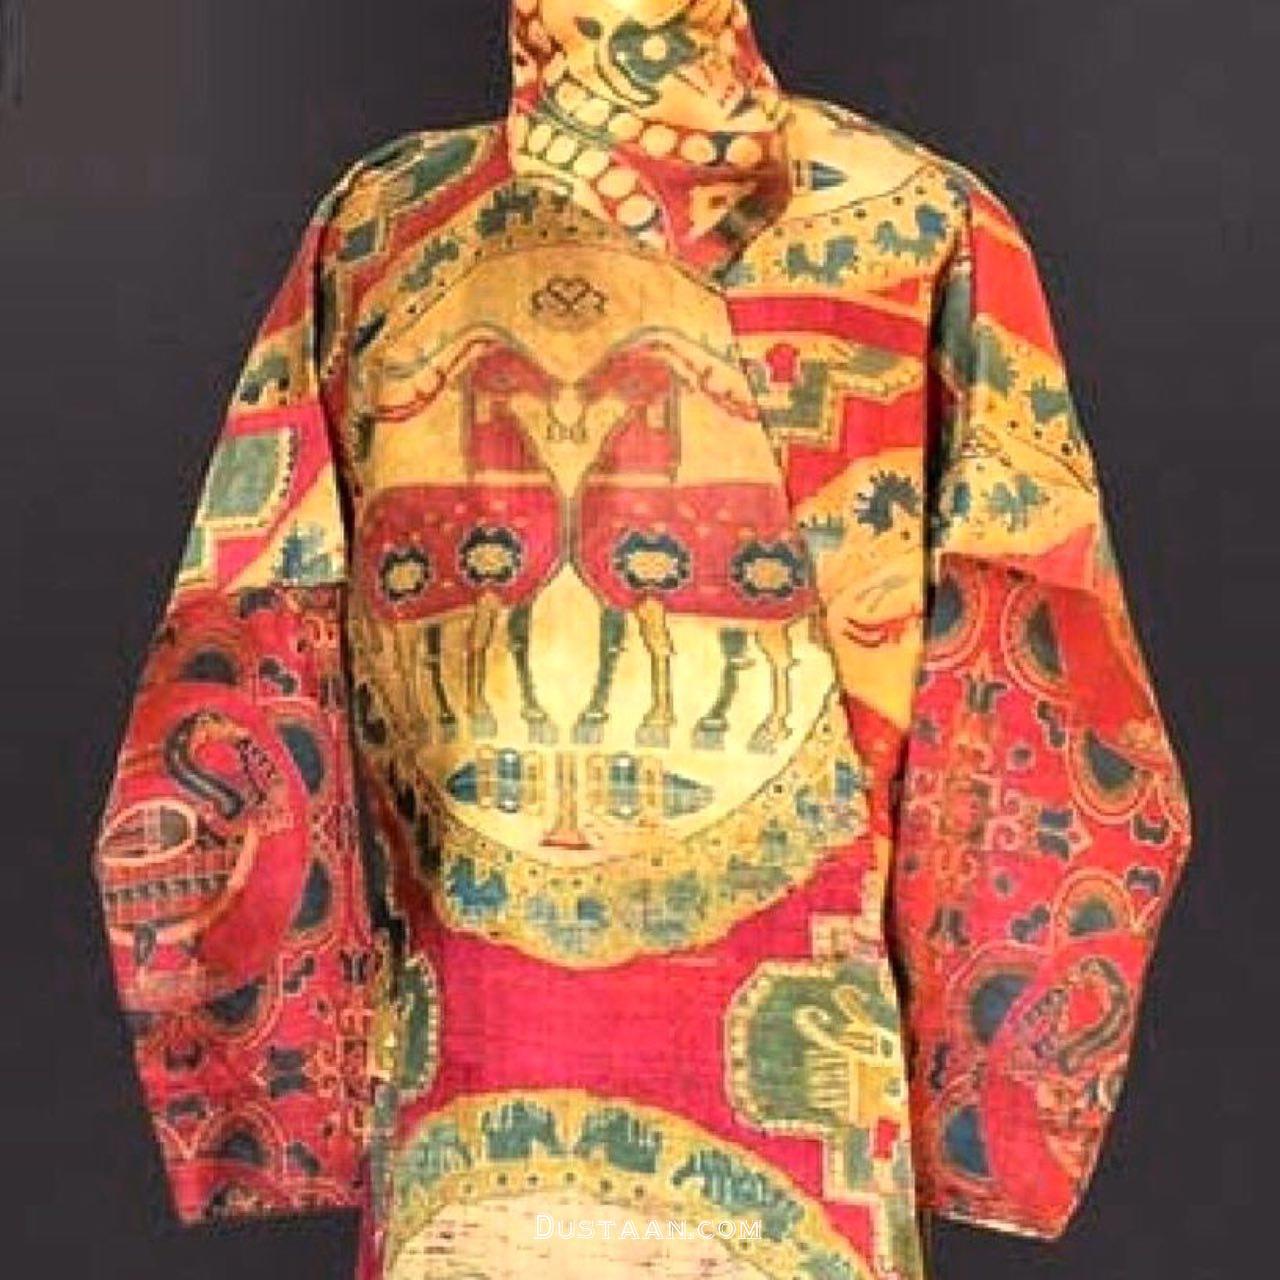 www.dustaan.com لباس خوشرنگ به جا مانده از دوره ساسانی! +عکس